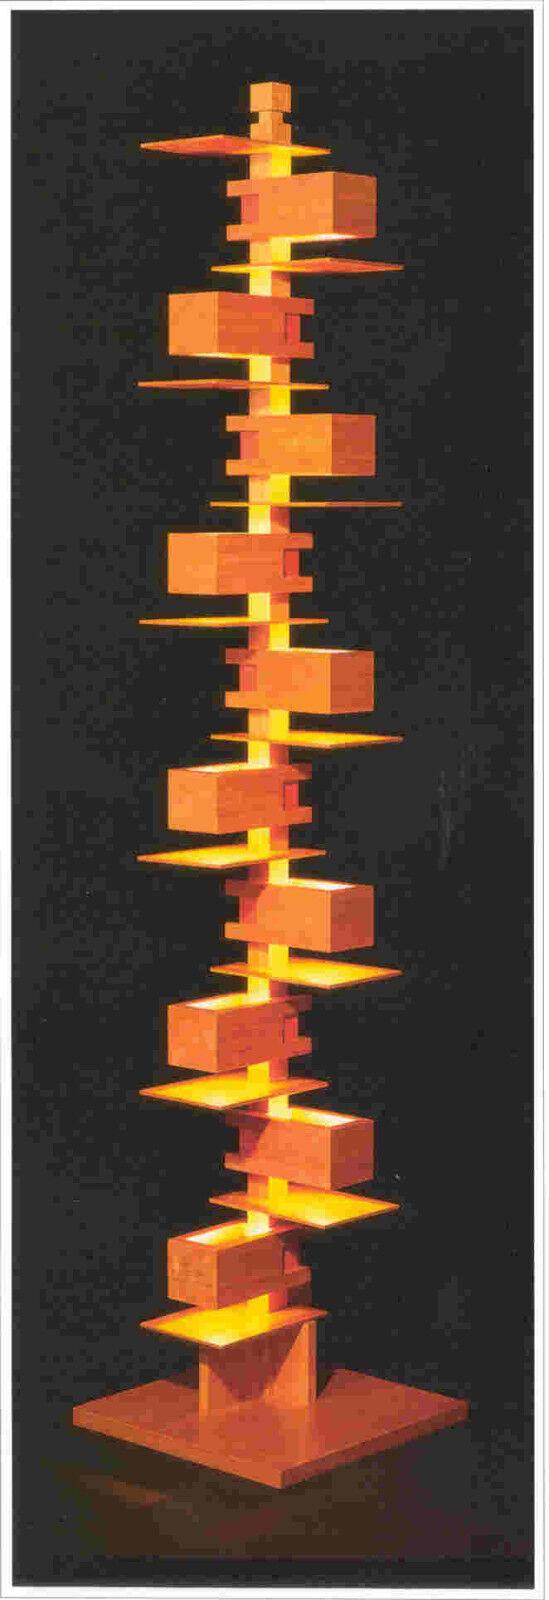 Taliesin 2 Floor Lamp, Frank Lloyd Wright authorized reproduction